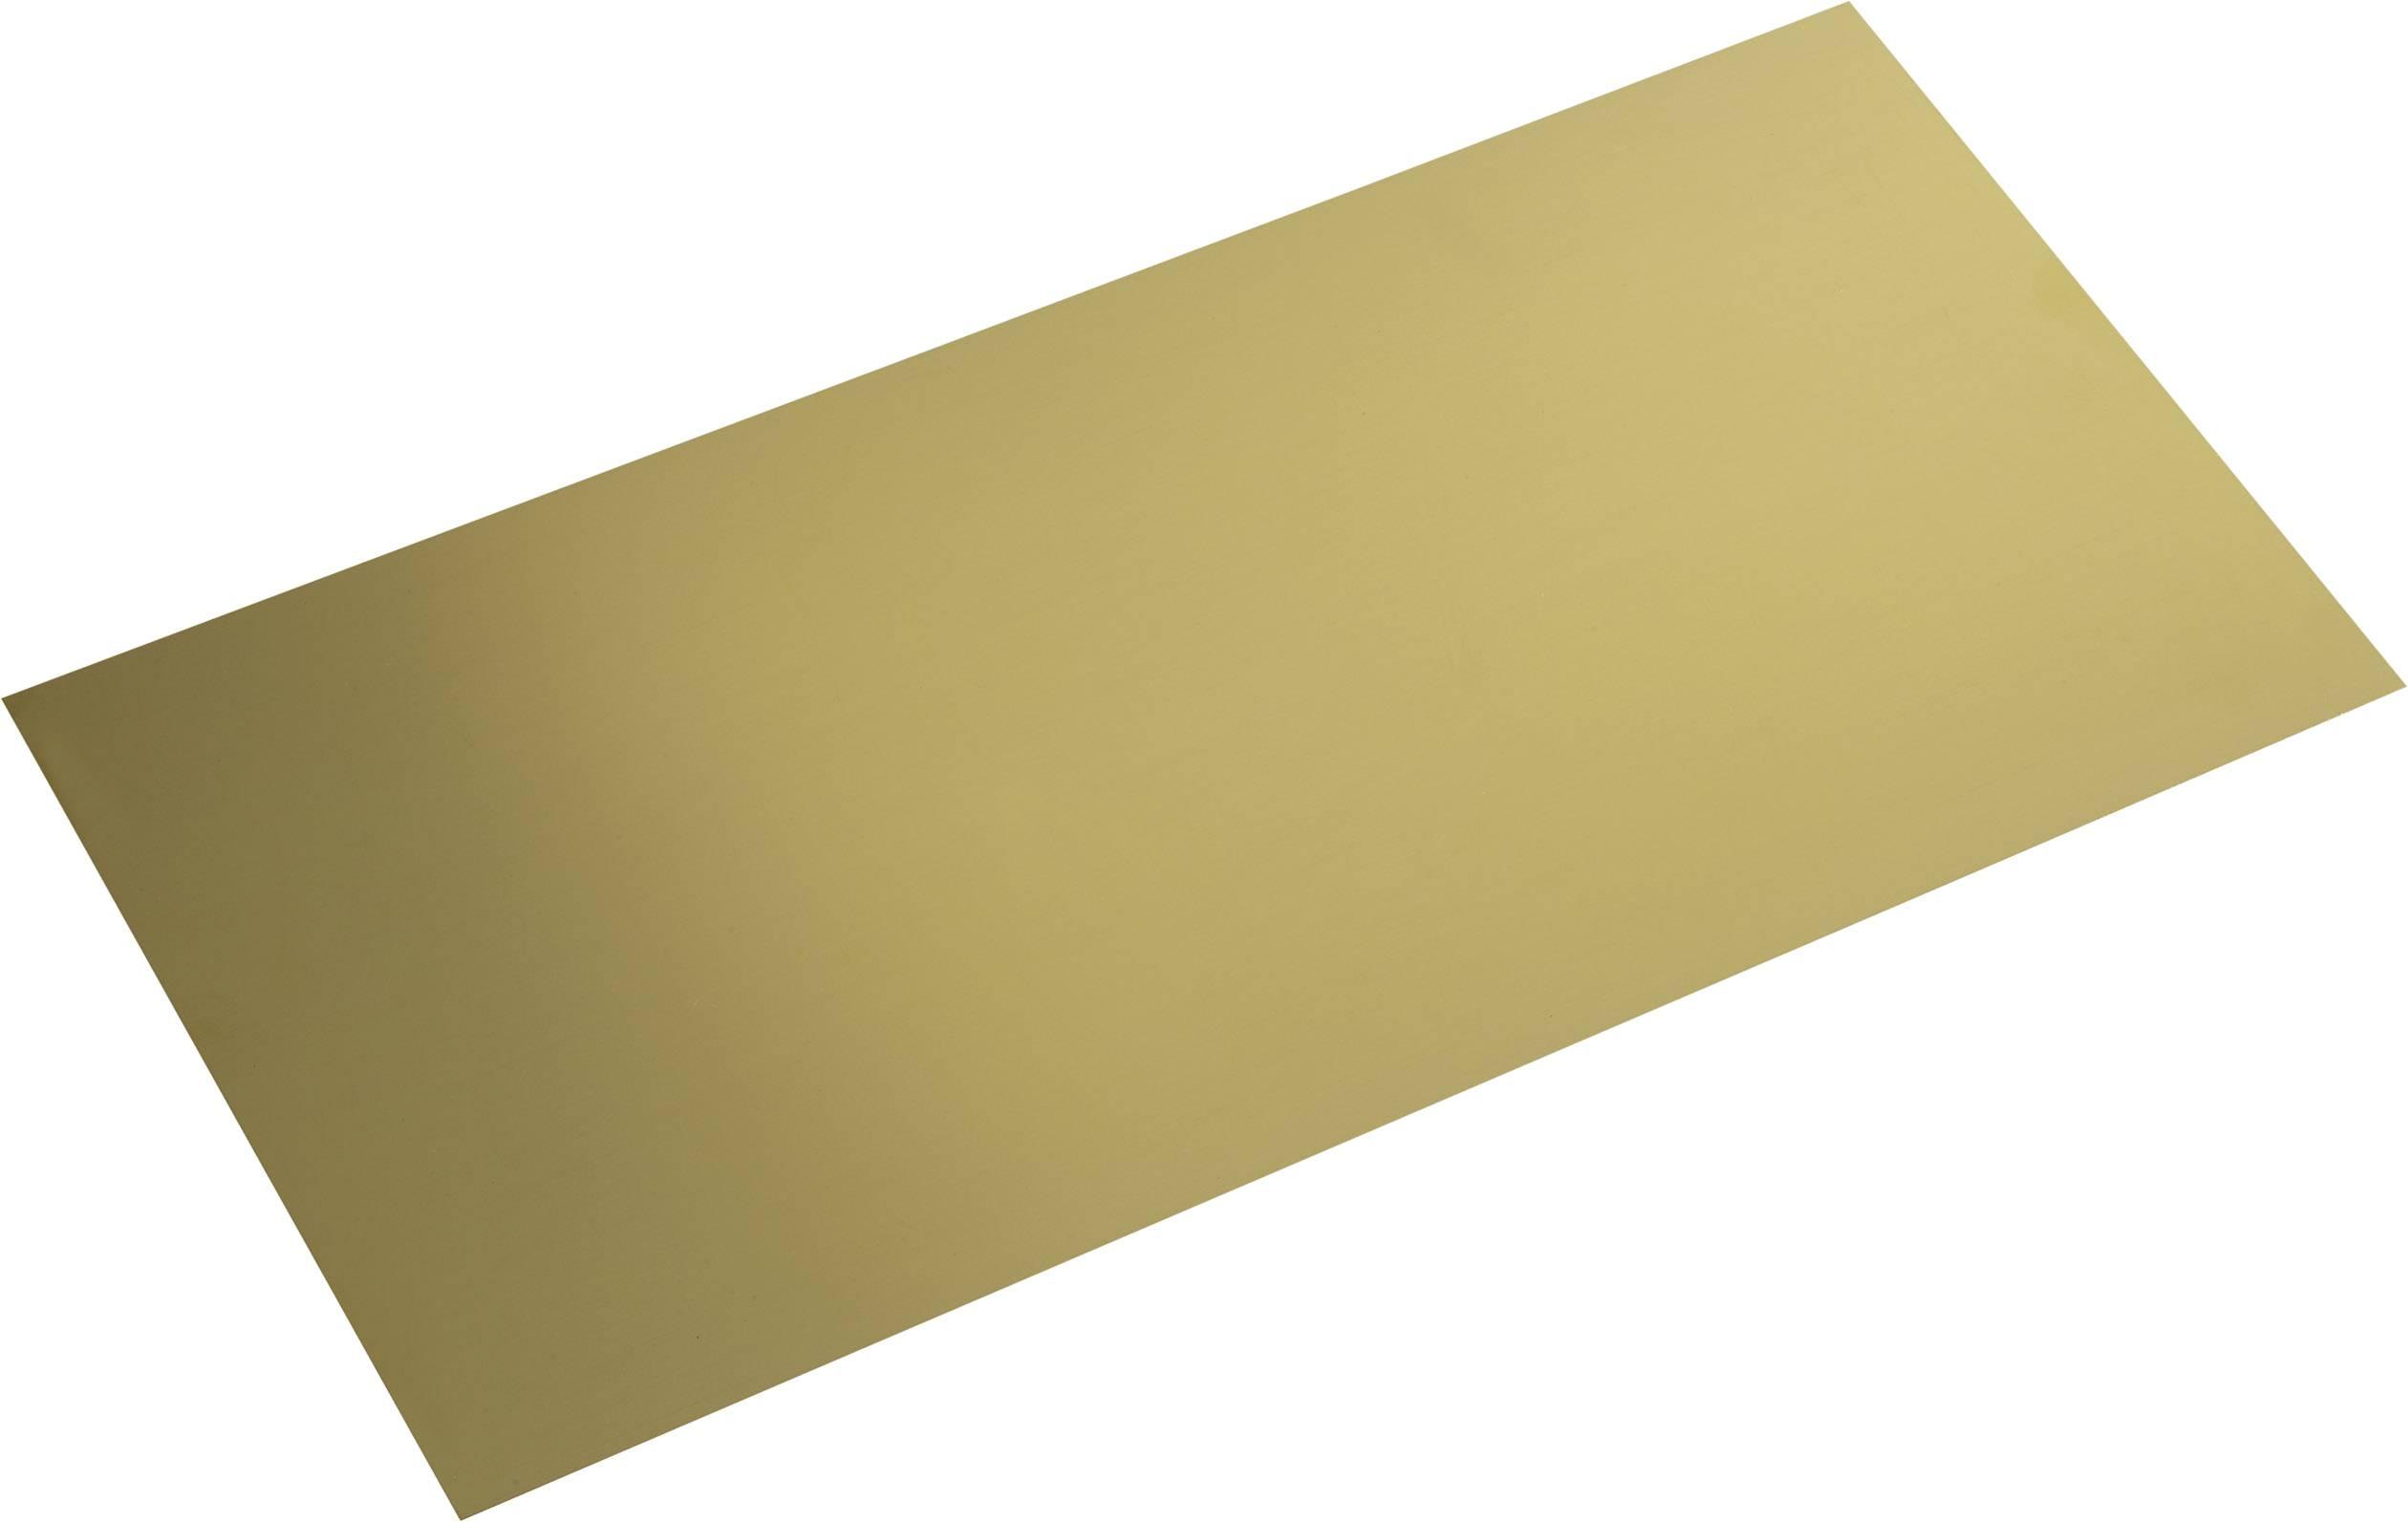 Messing Blech (L x B) 400 mm x 200 mm 1.2 mm 1 St.